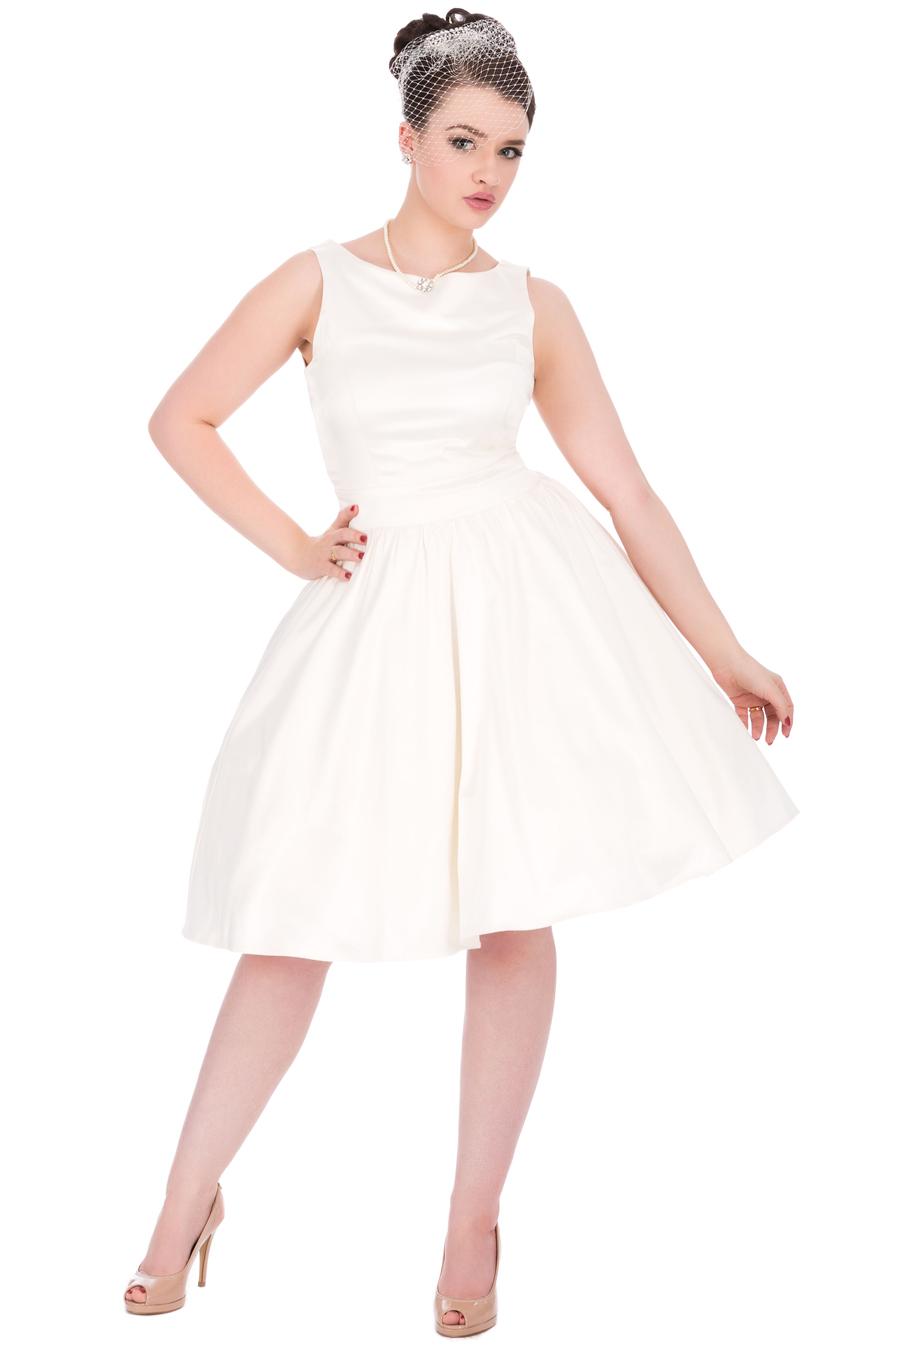 Favoriete Lady Vintage 50s Style Ivory Wedding Dress - Miss Vintage #IV29